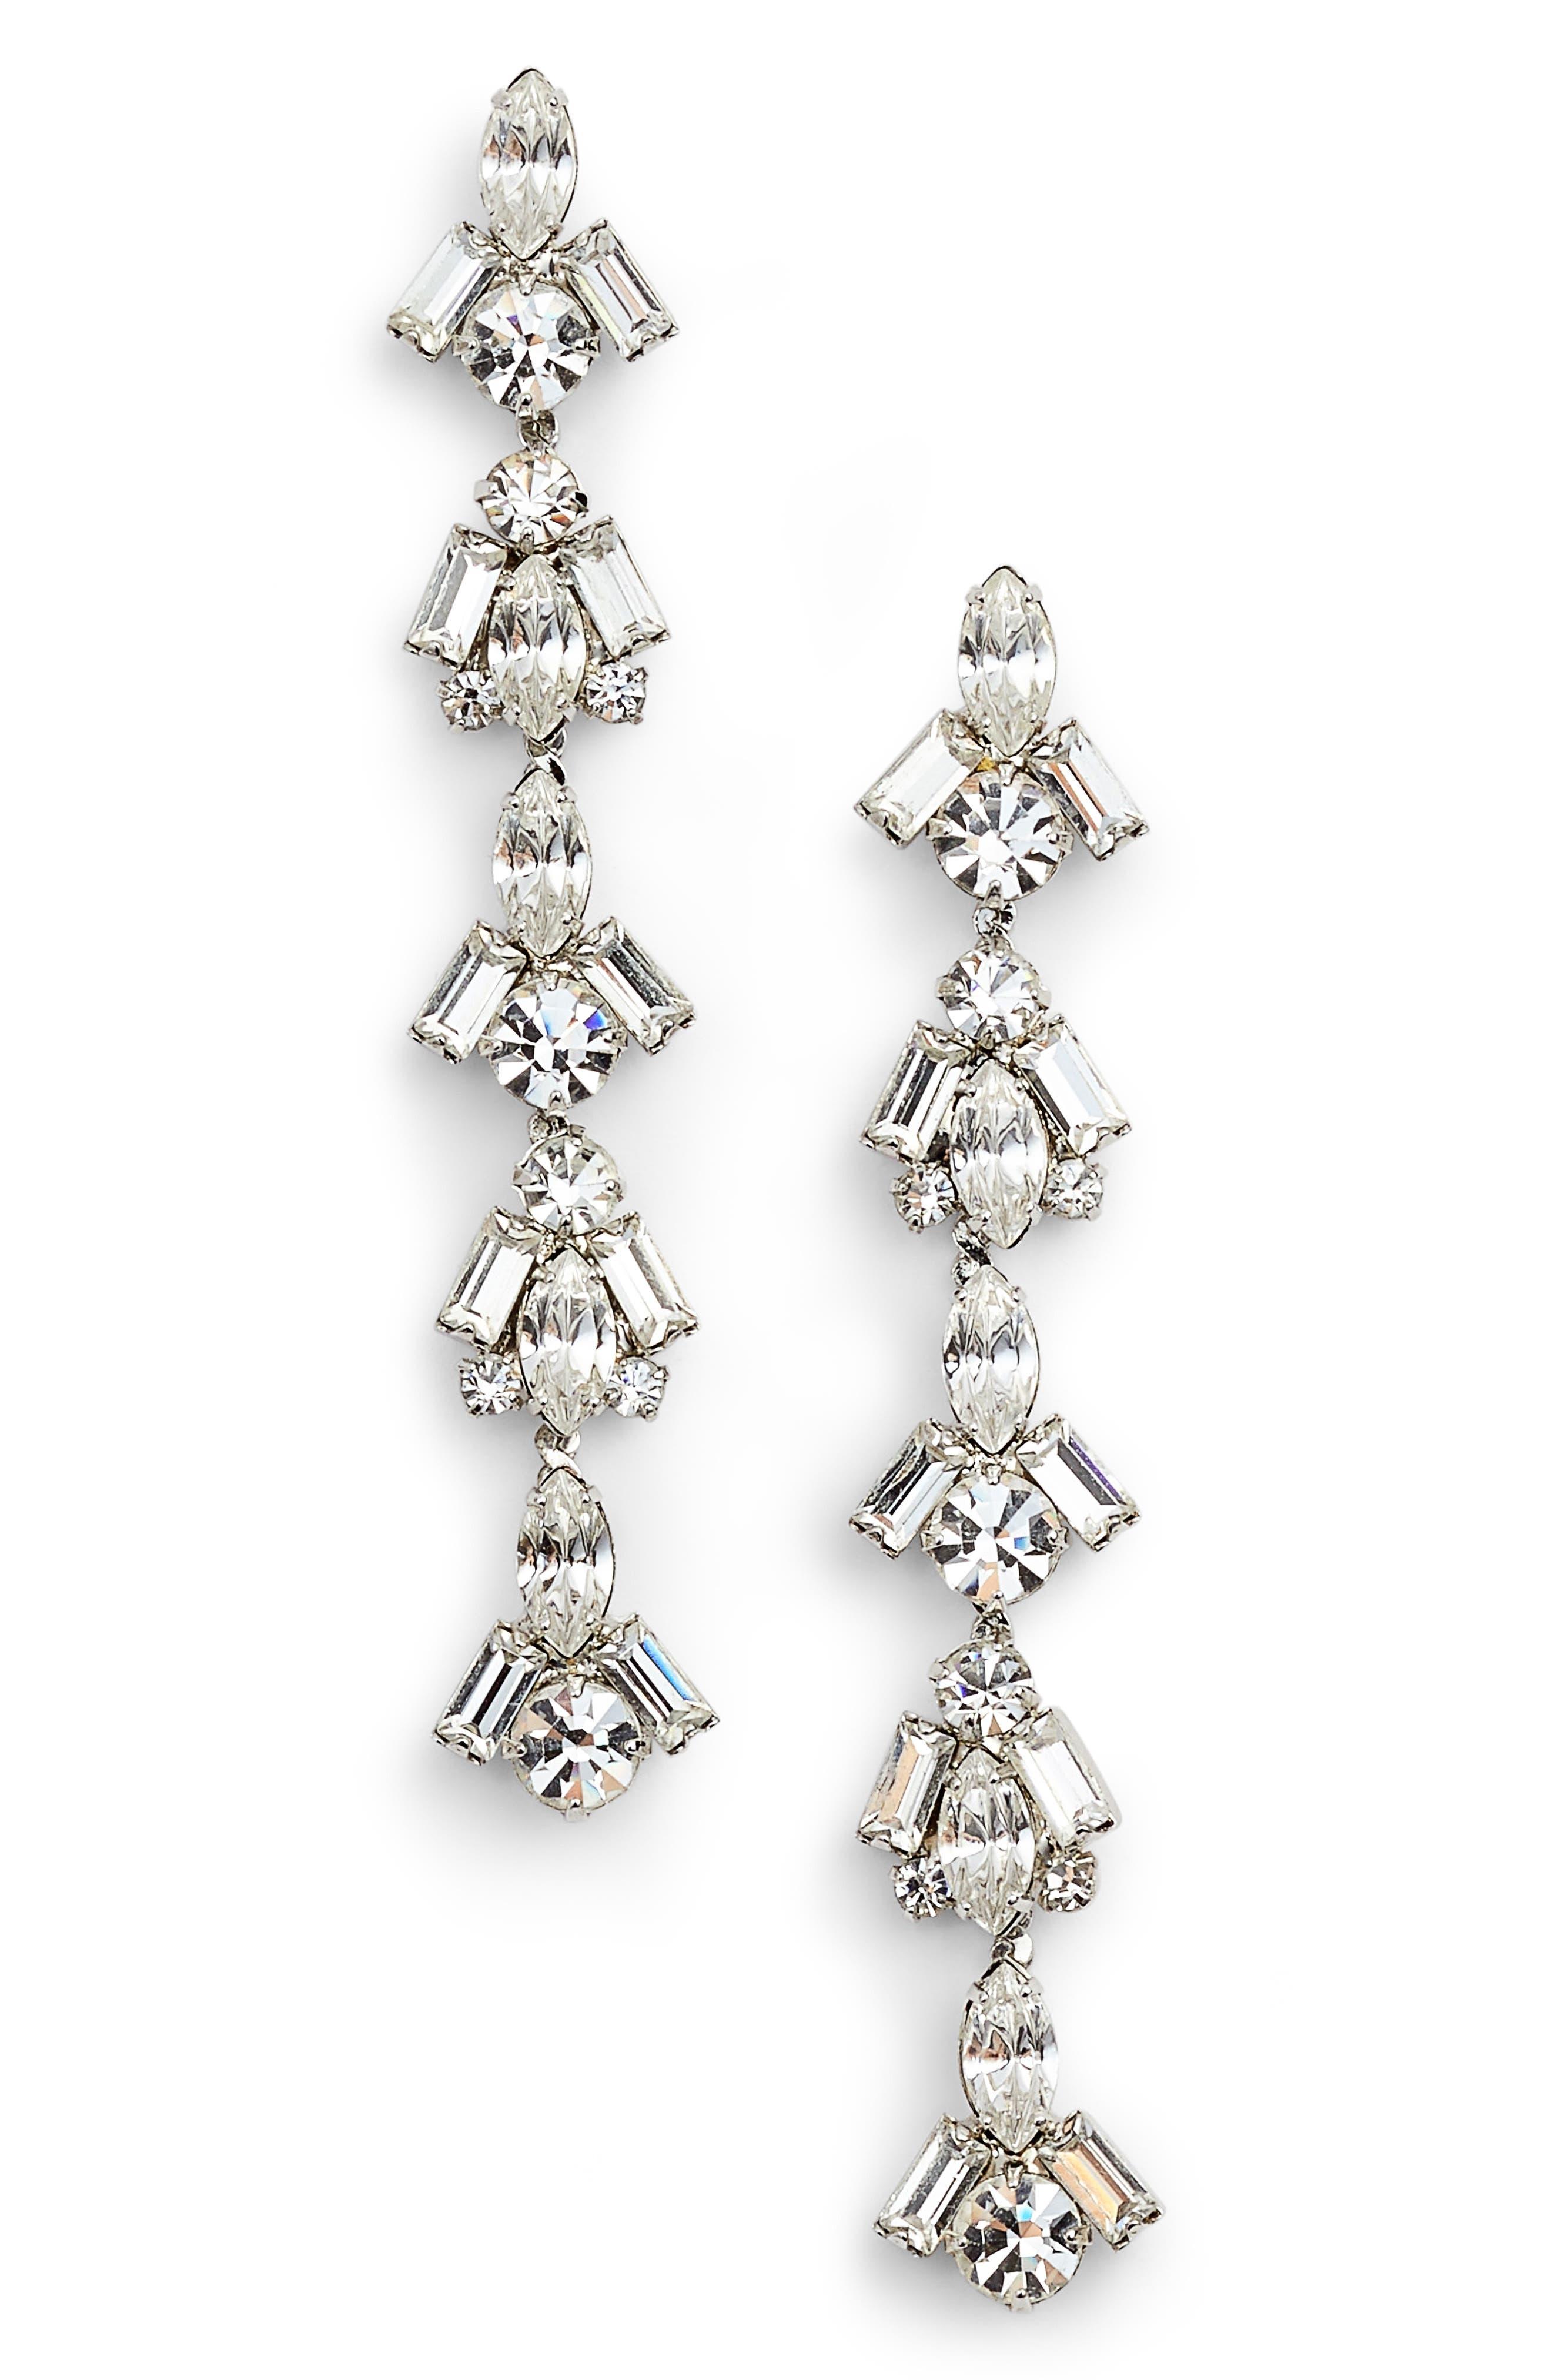 Crystal Linear Drop Earrings,                             Main thumbnail 1, color,                             040